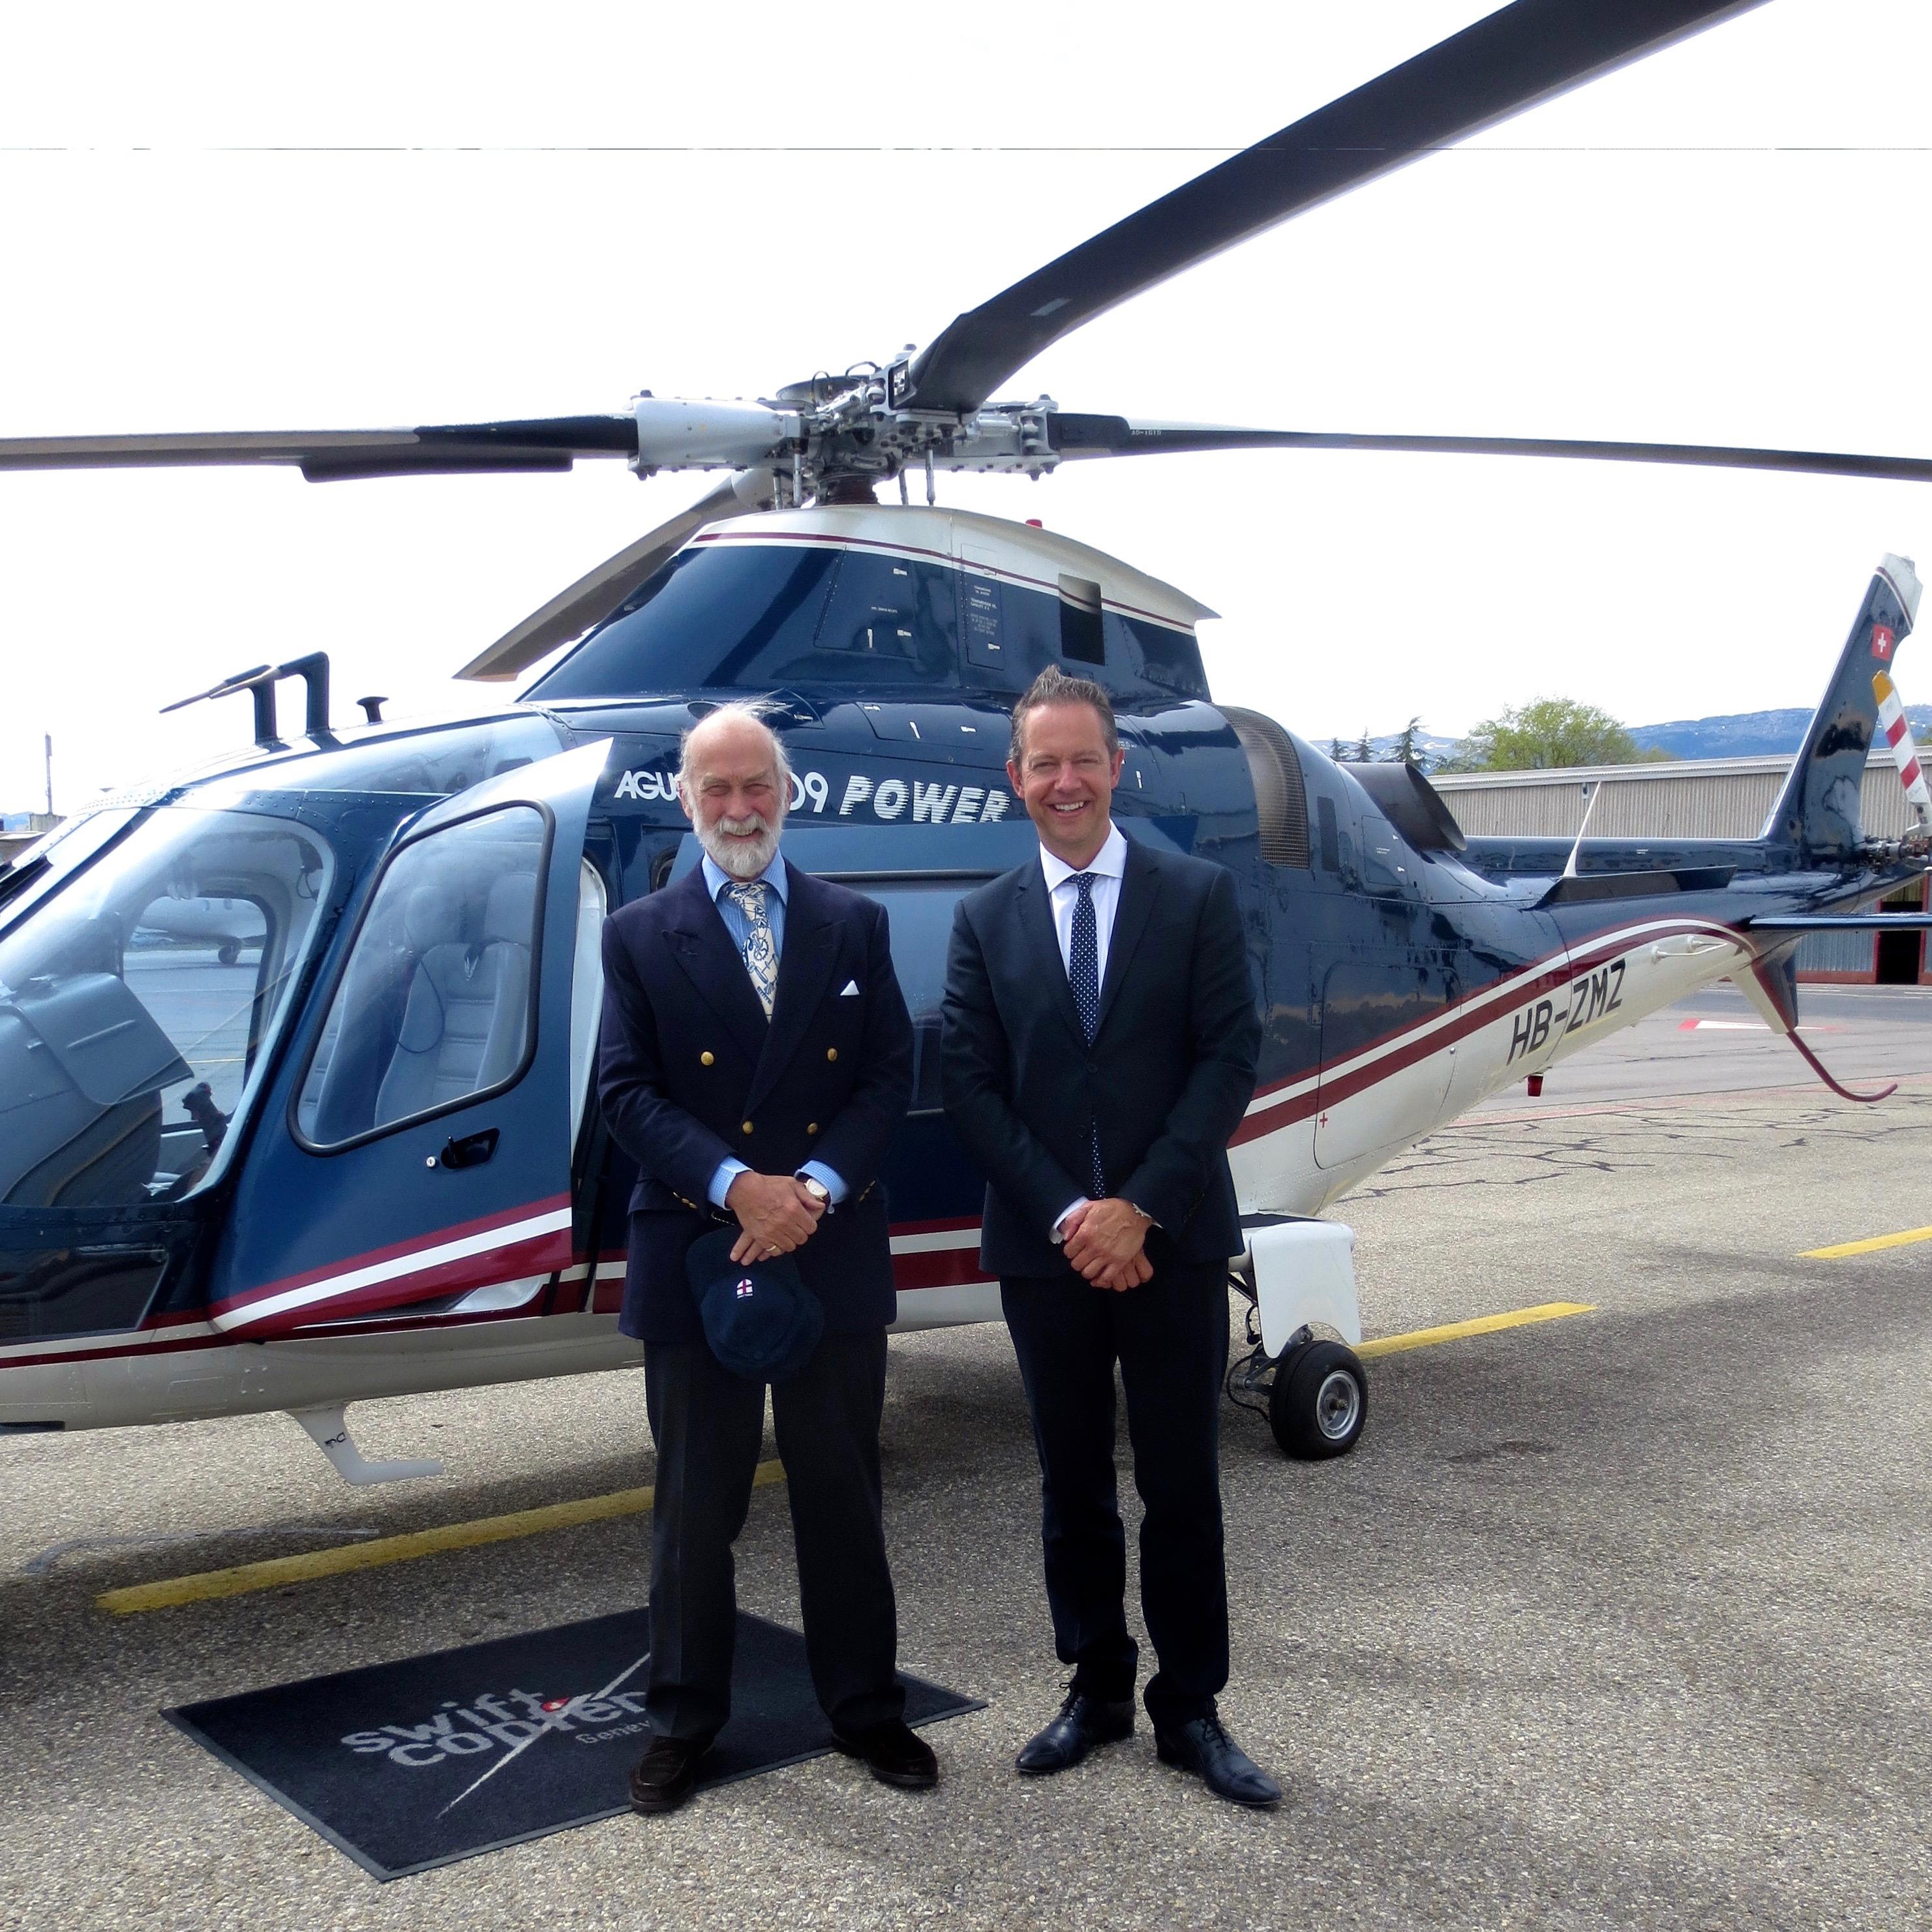 Prince Michael Visit to Geneva